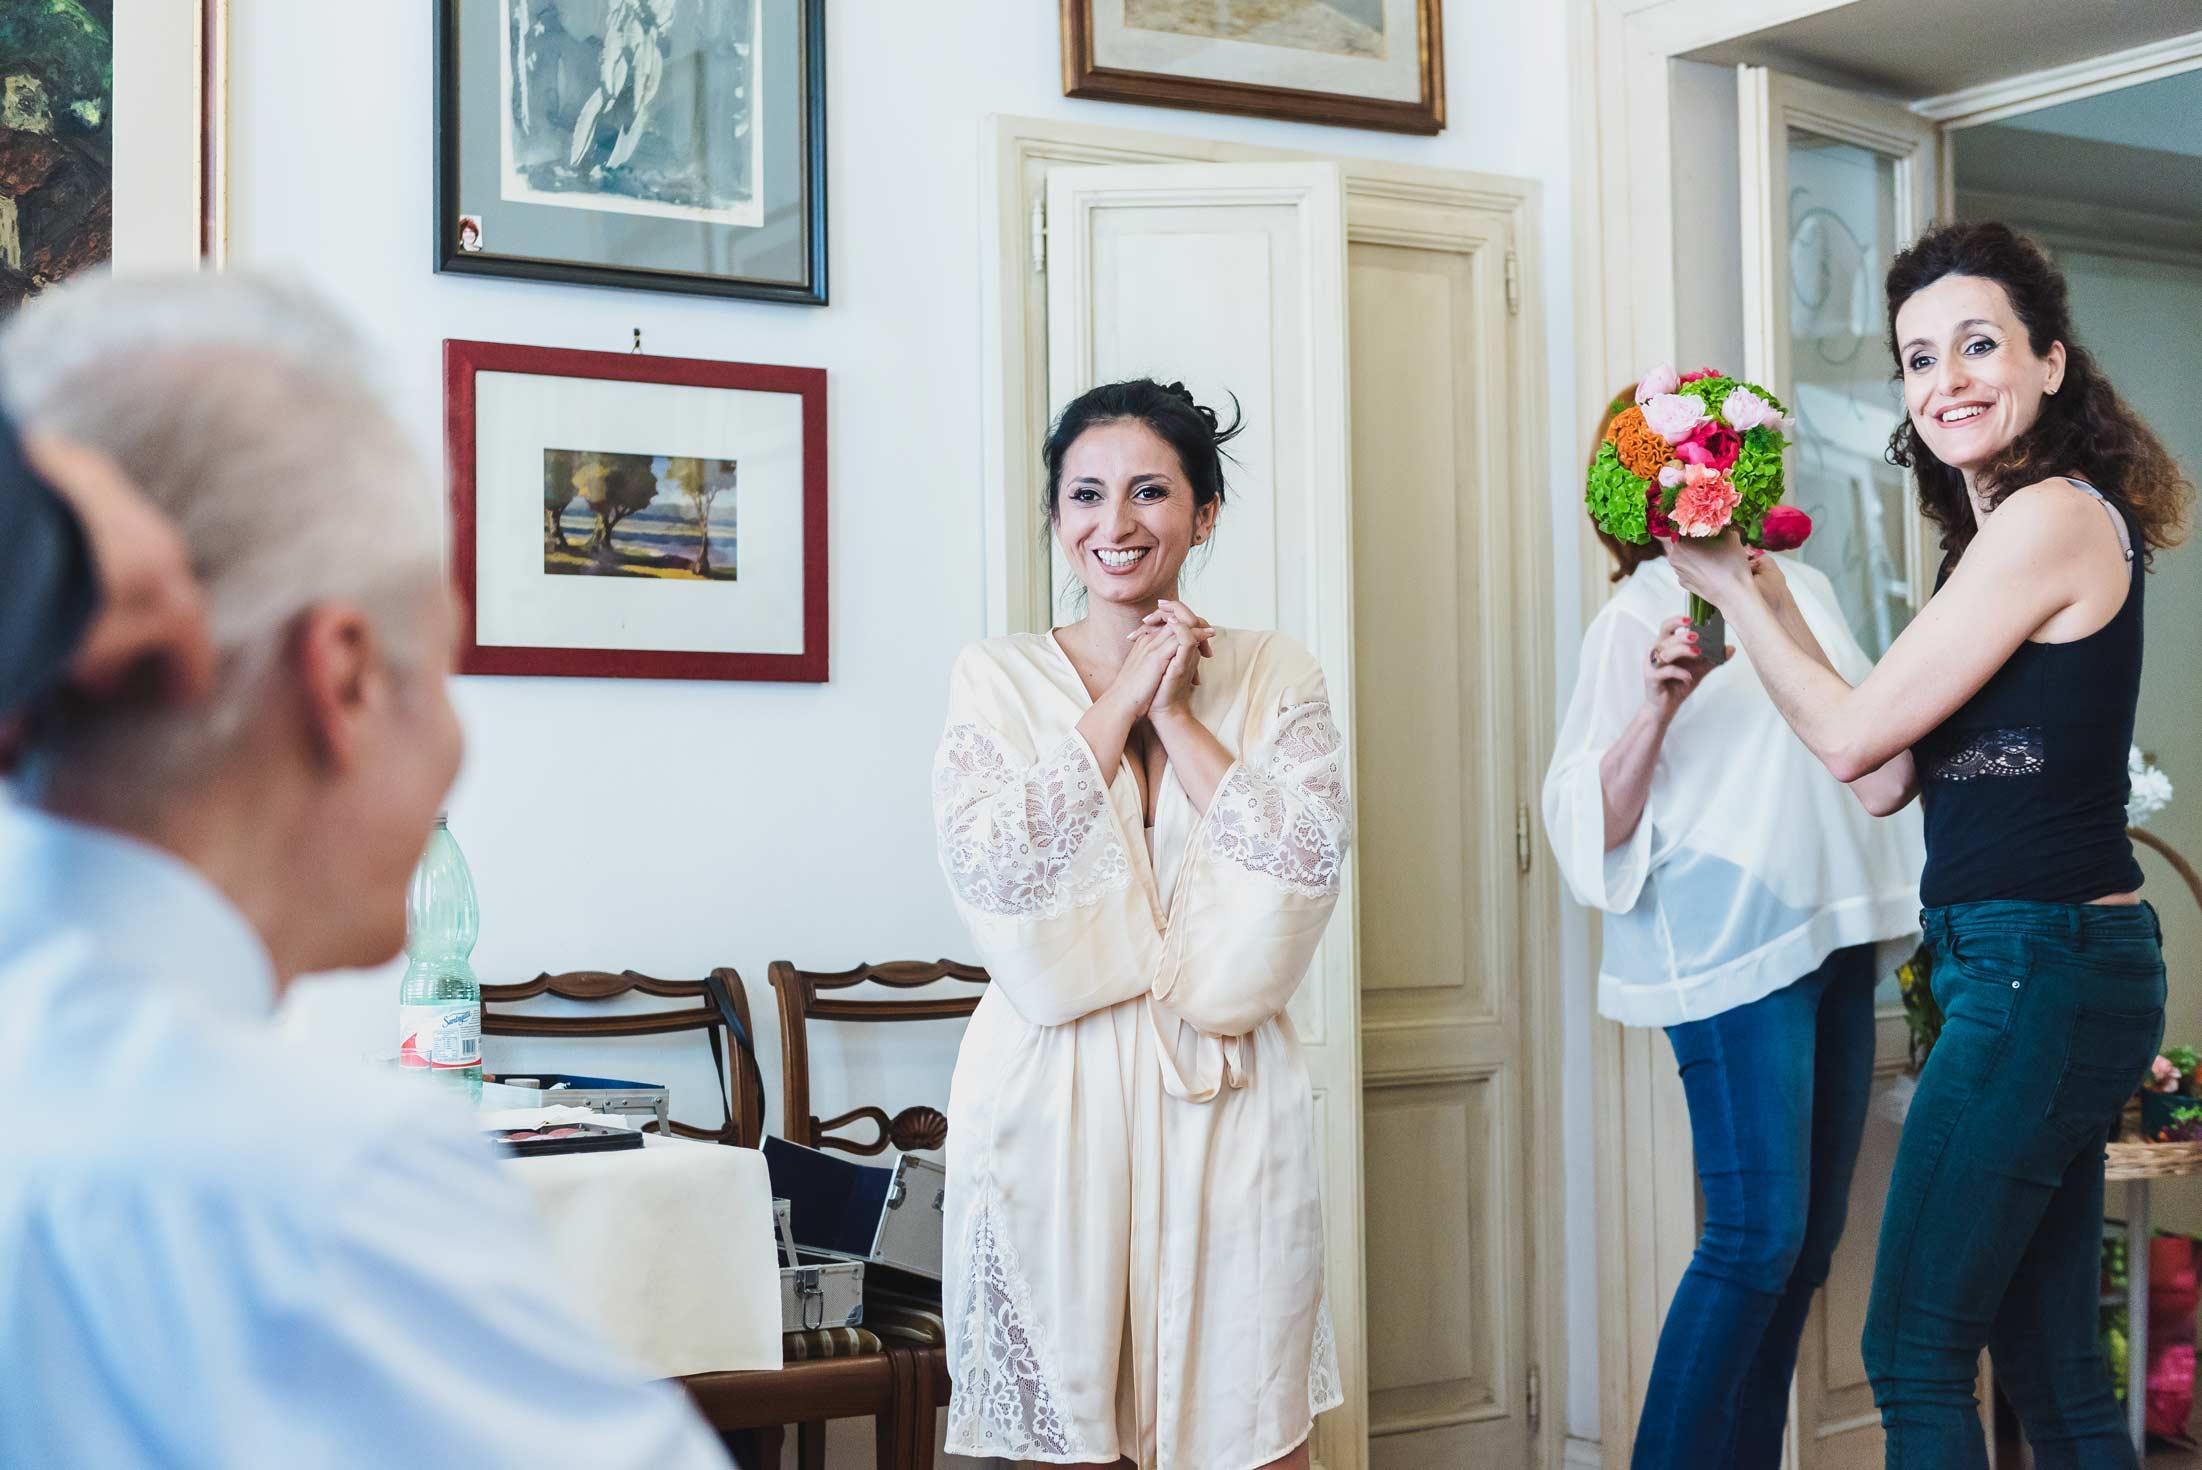 Matrimonio-Fotografo-Reportage-Preparativi-Sposa